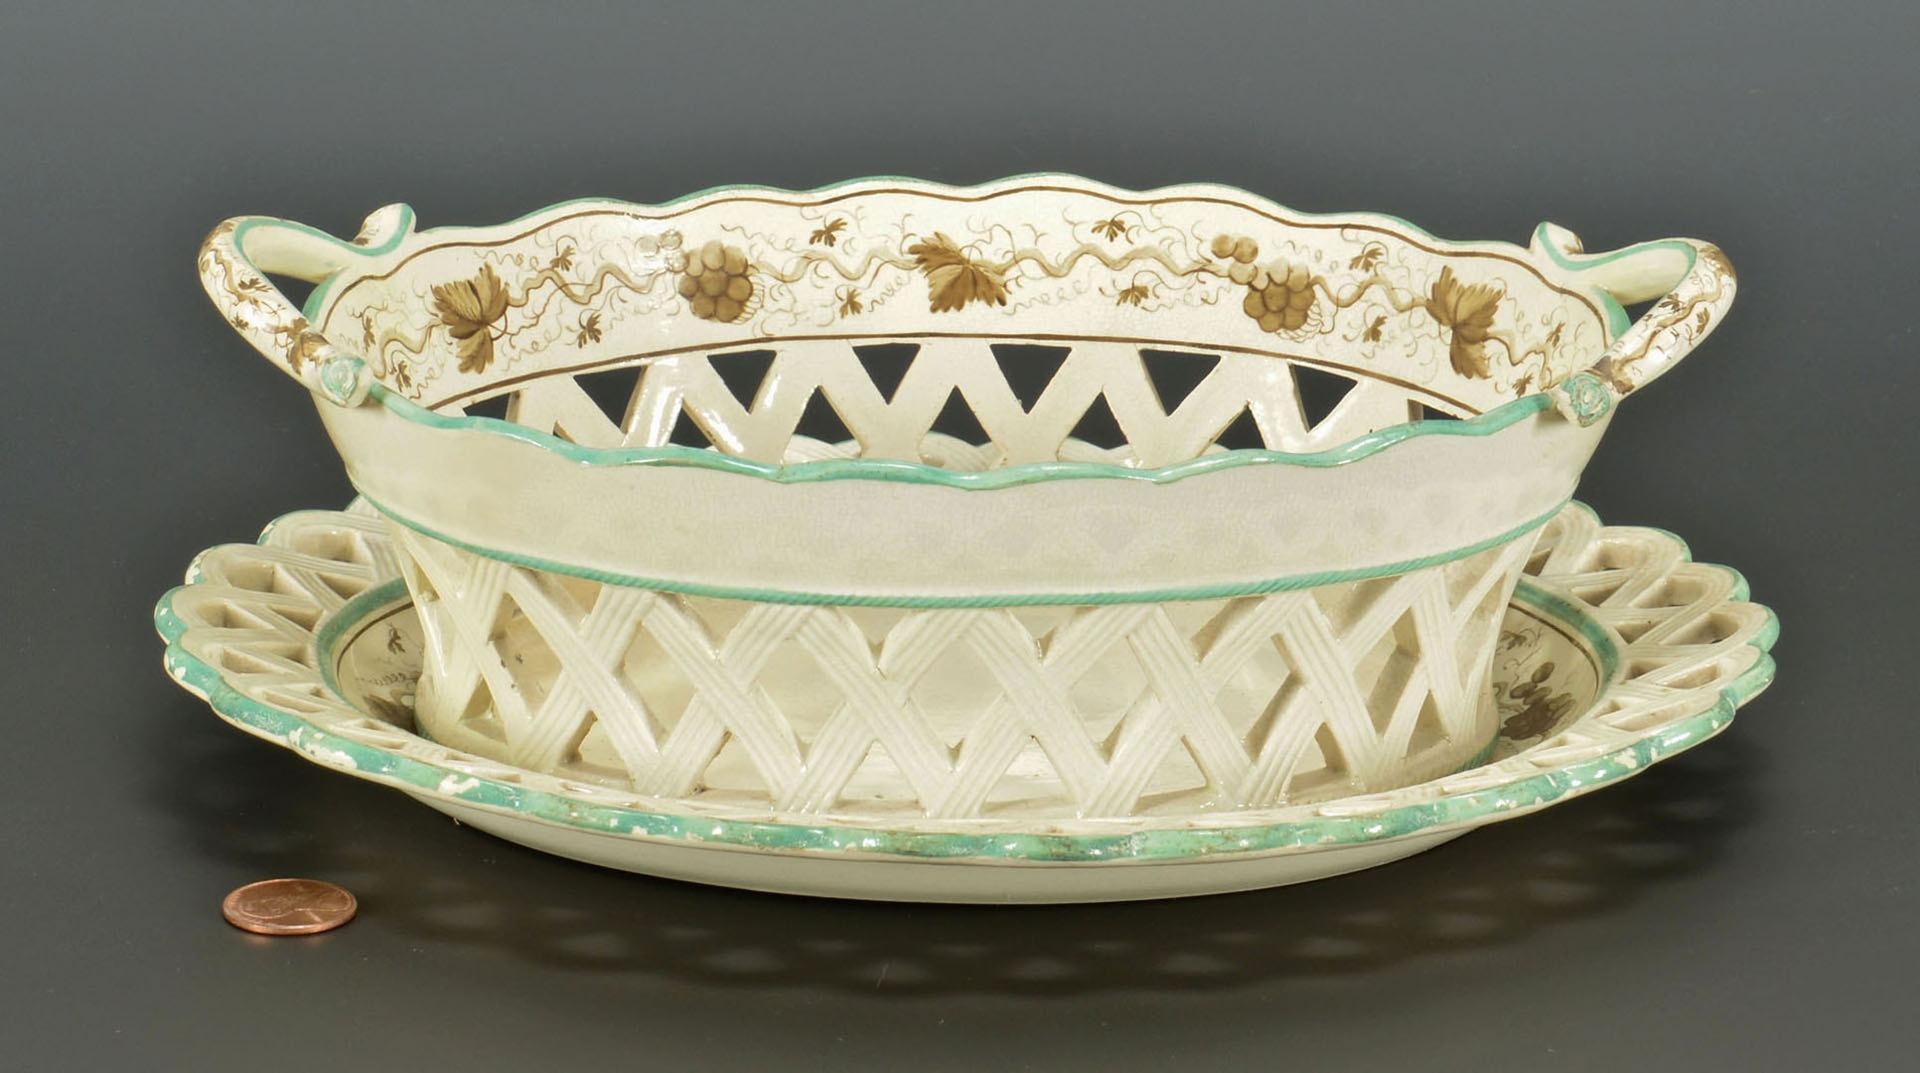 Lot 245: Creamware basket, underplate with grapevine dec